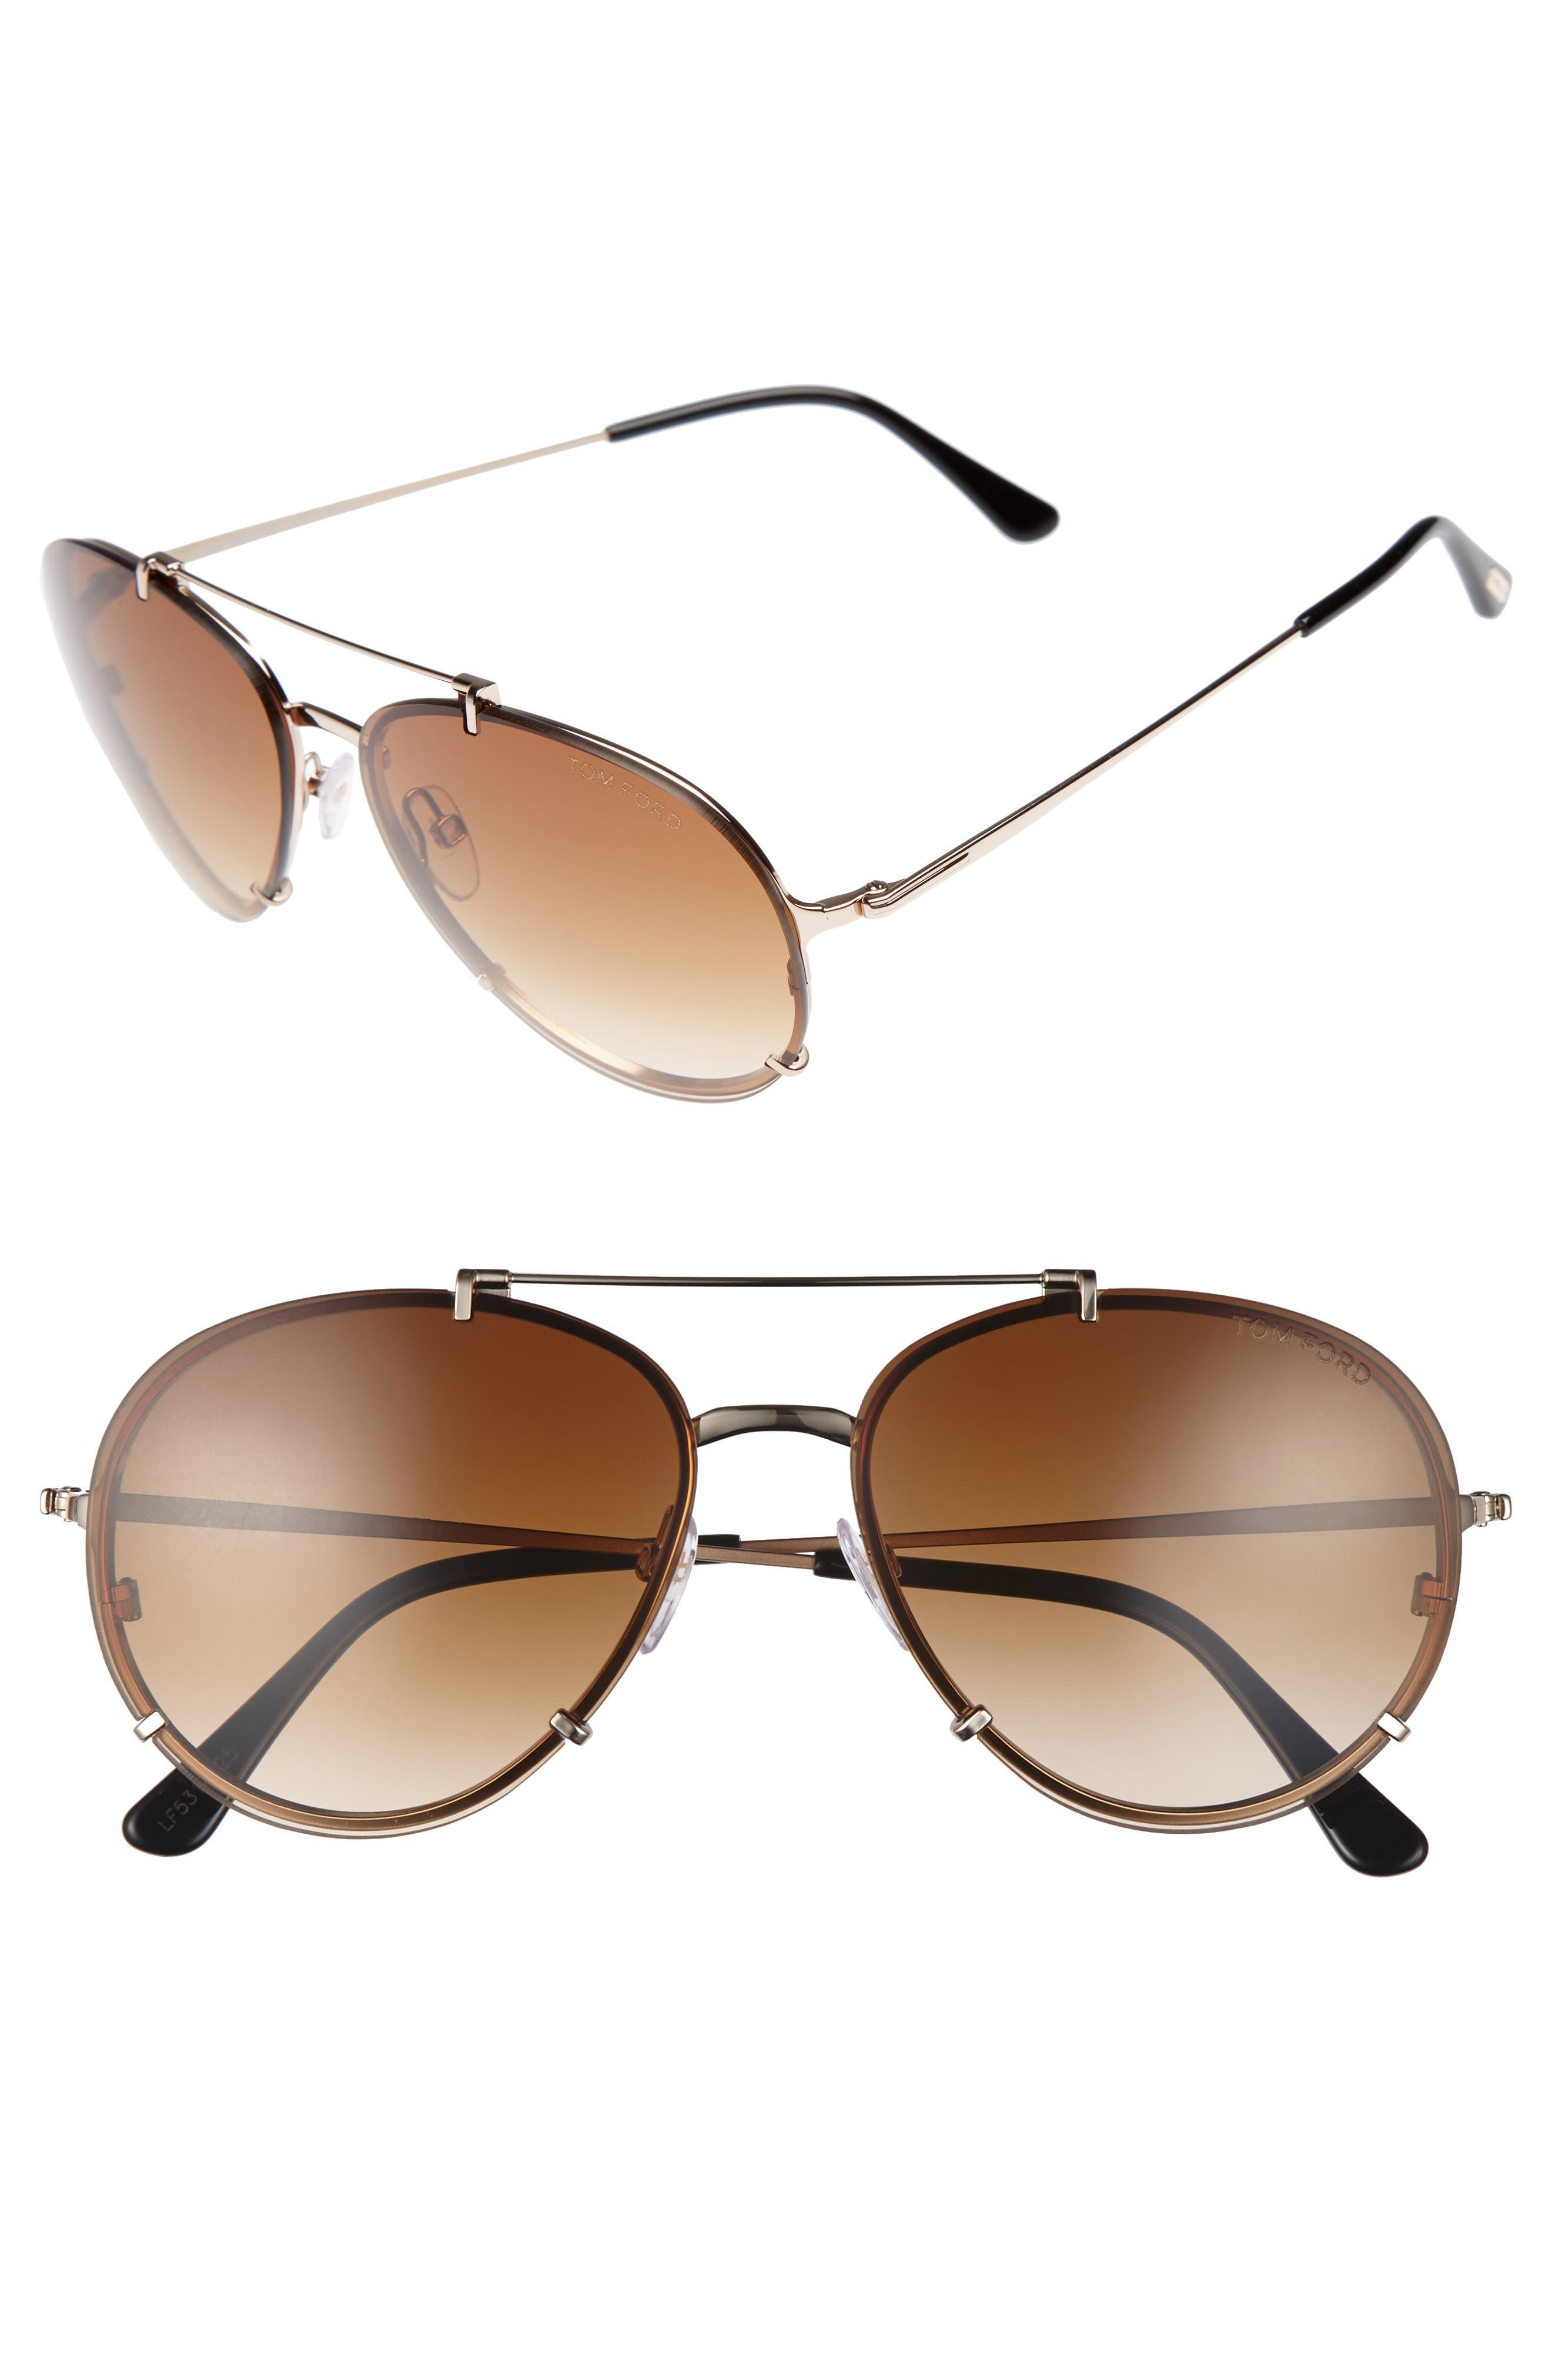 Tom Ford Dickon 59mm Aviator Sunglasses